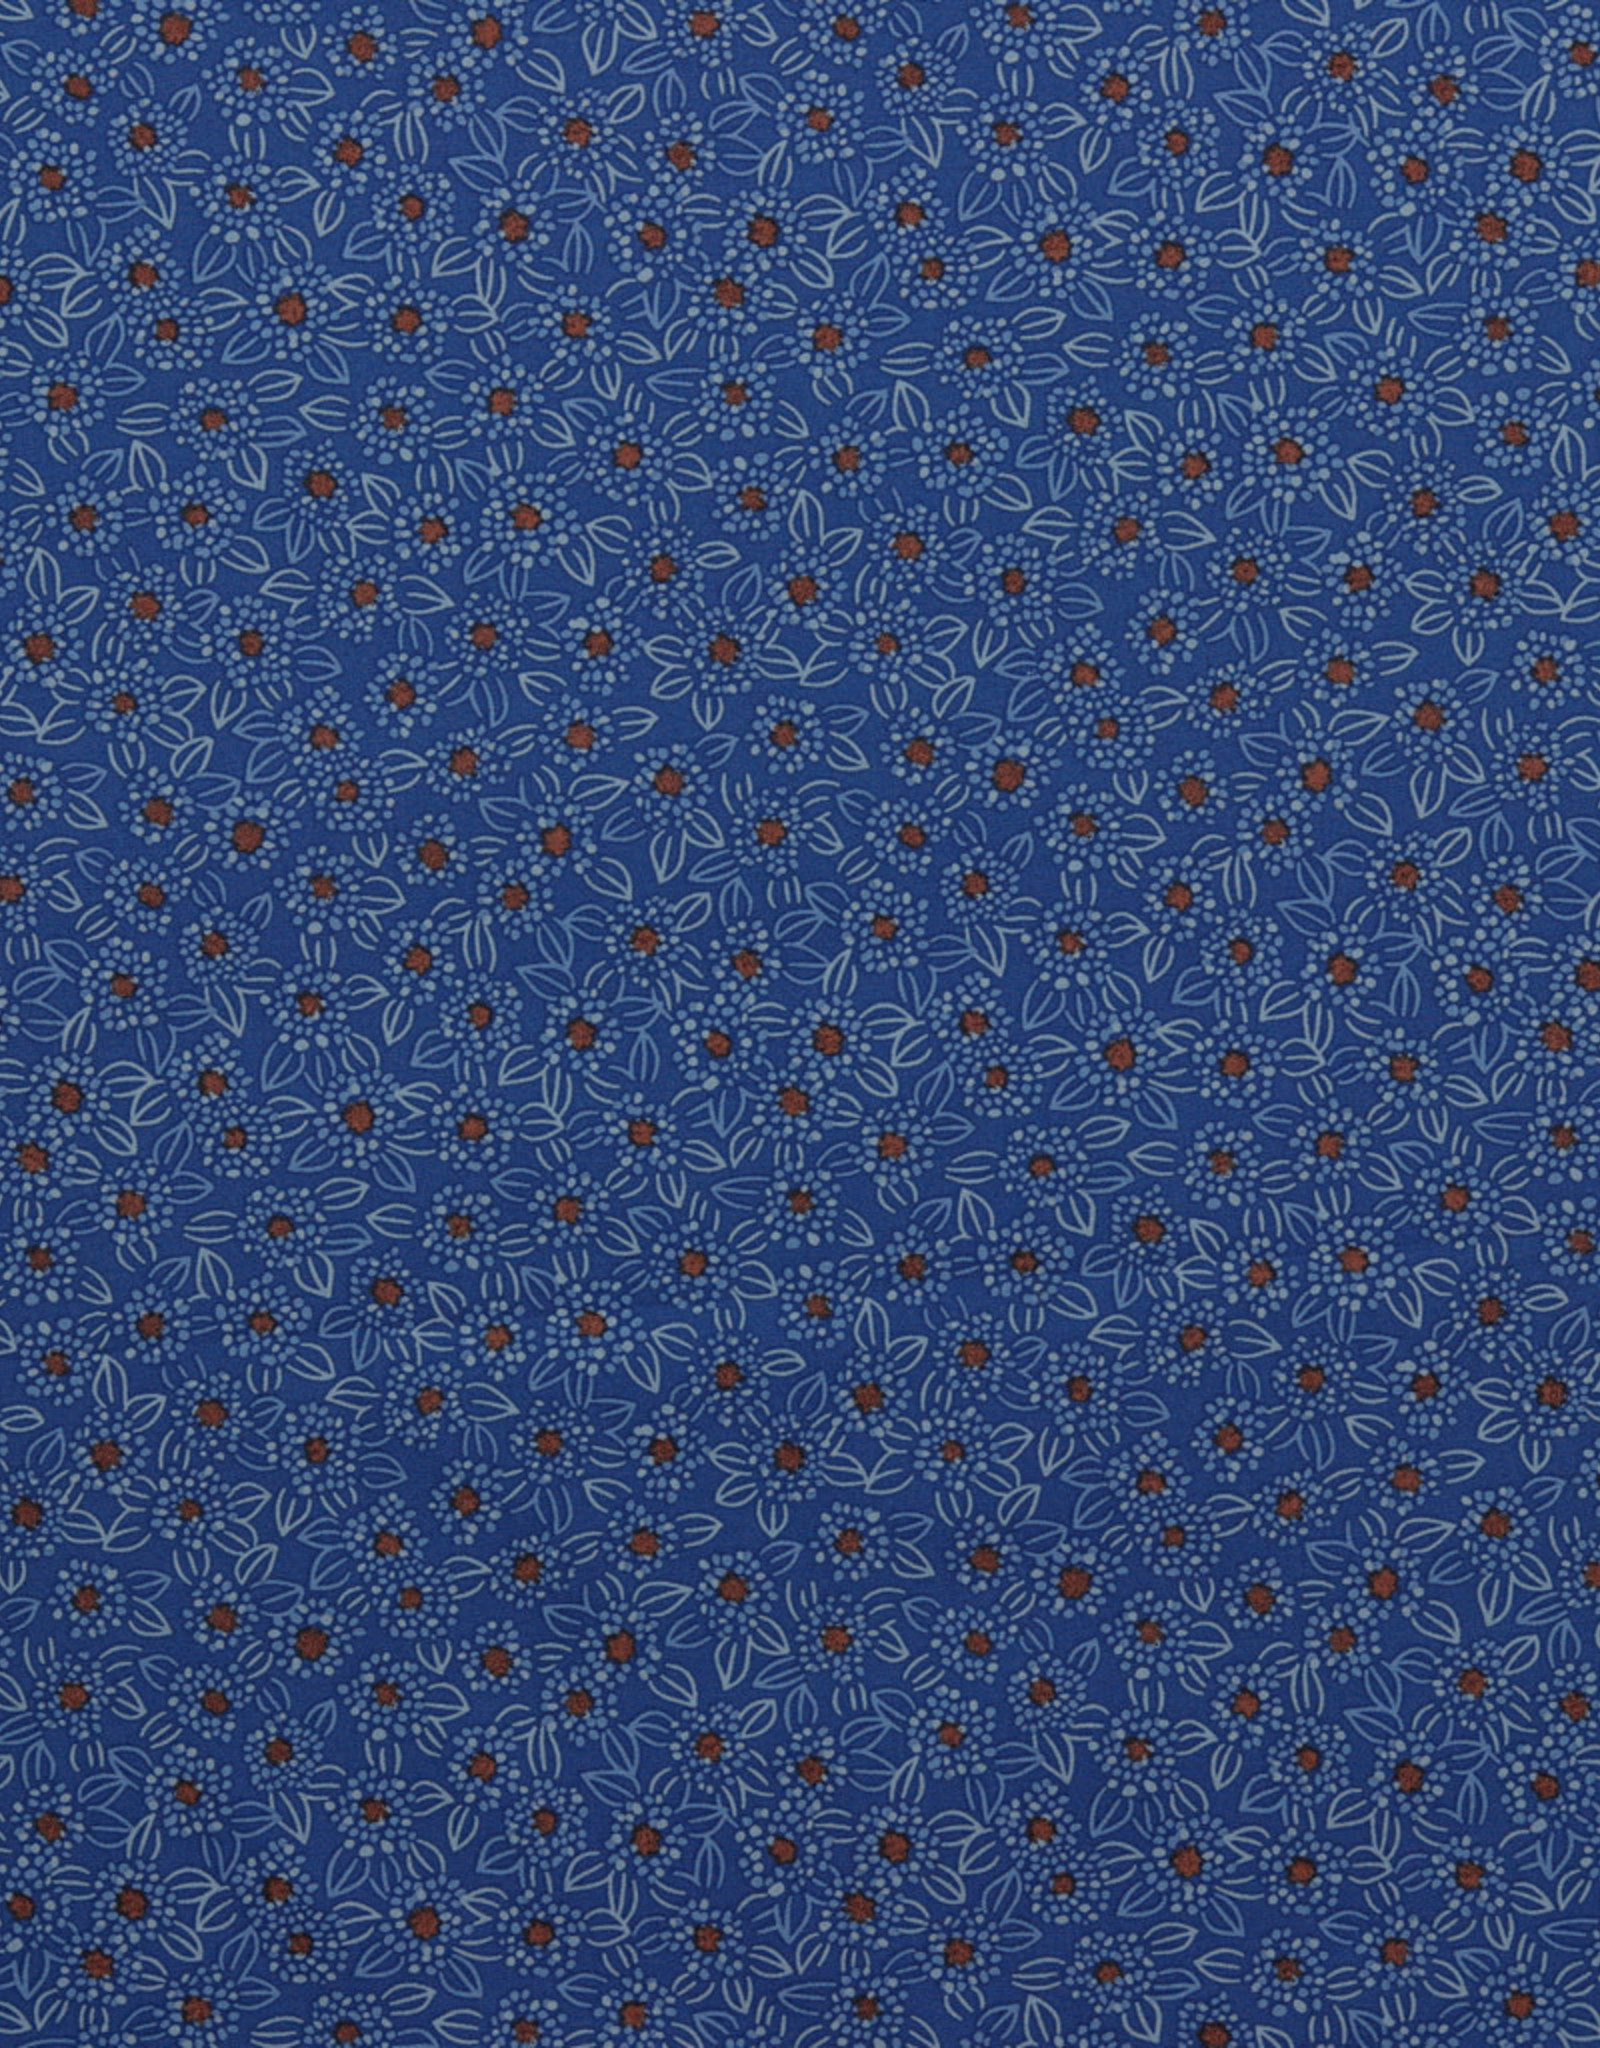 Poppy Poppy Katoen stretch blauw met bloementjes